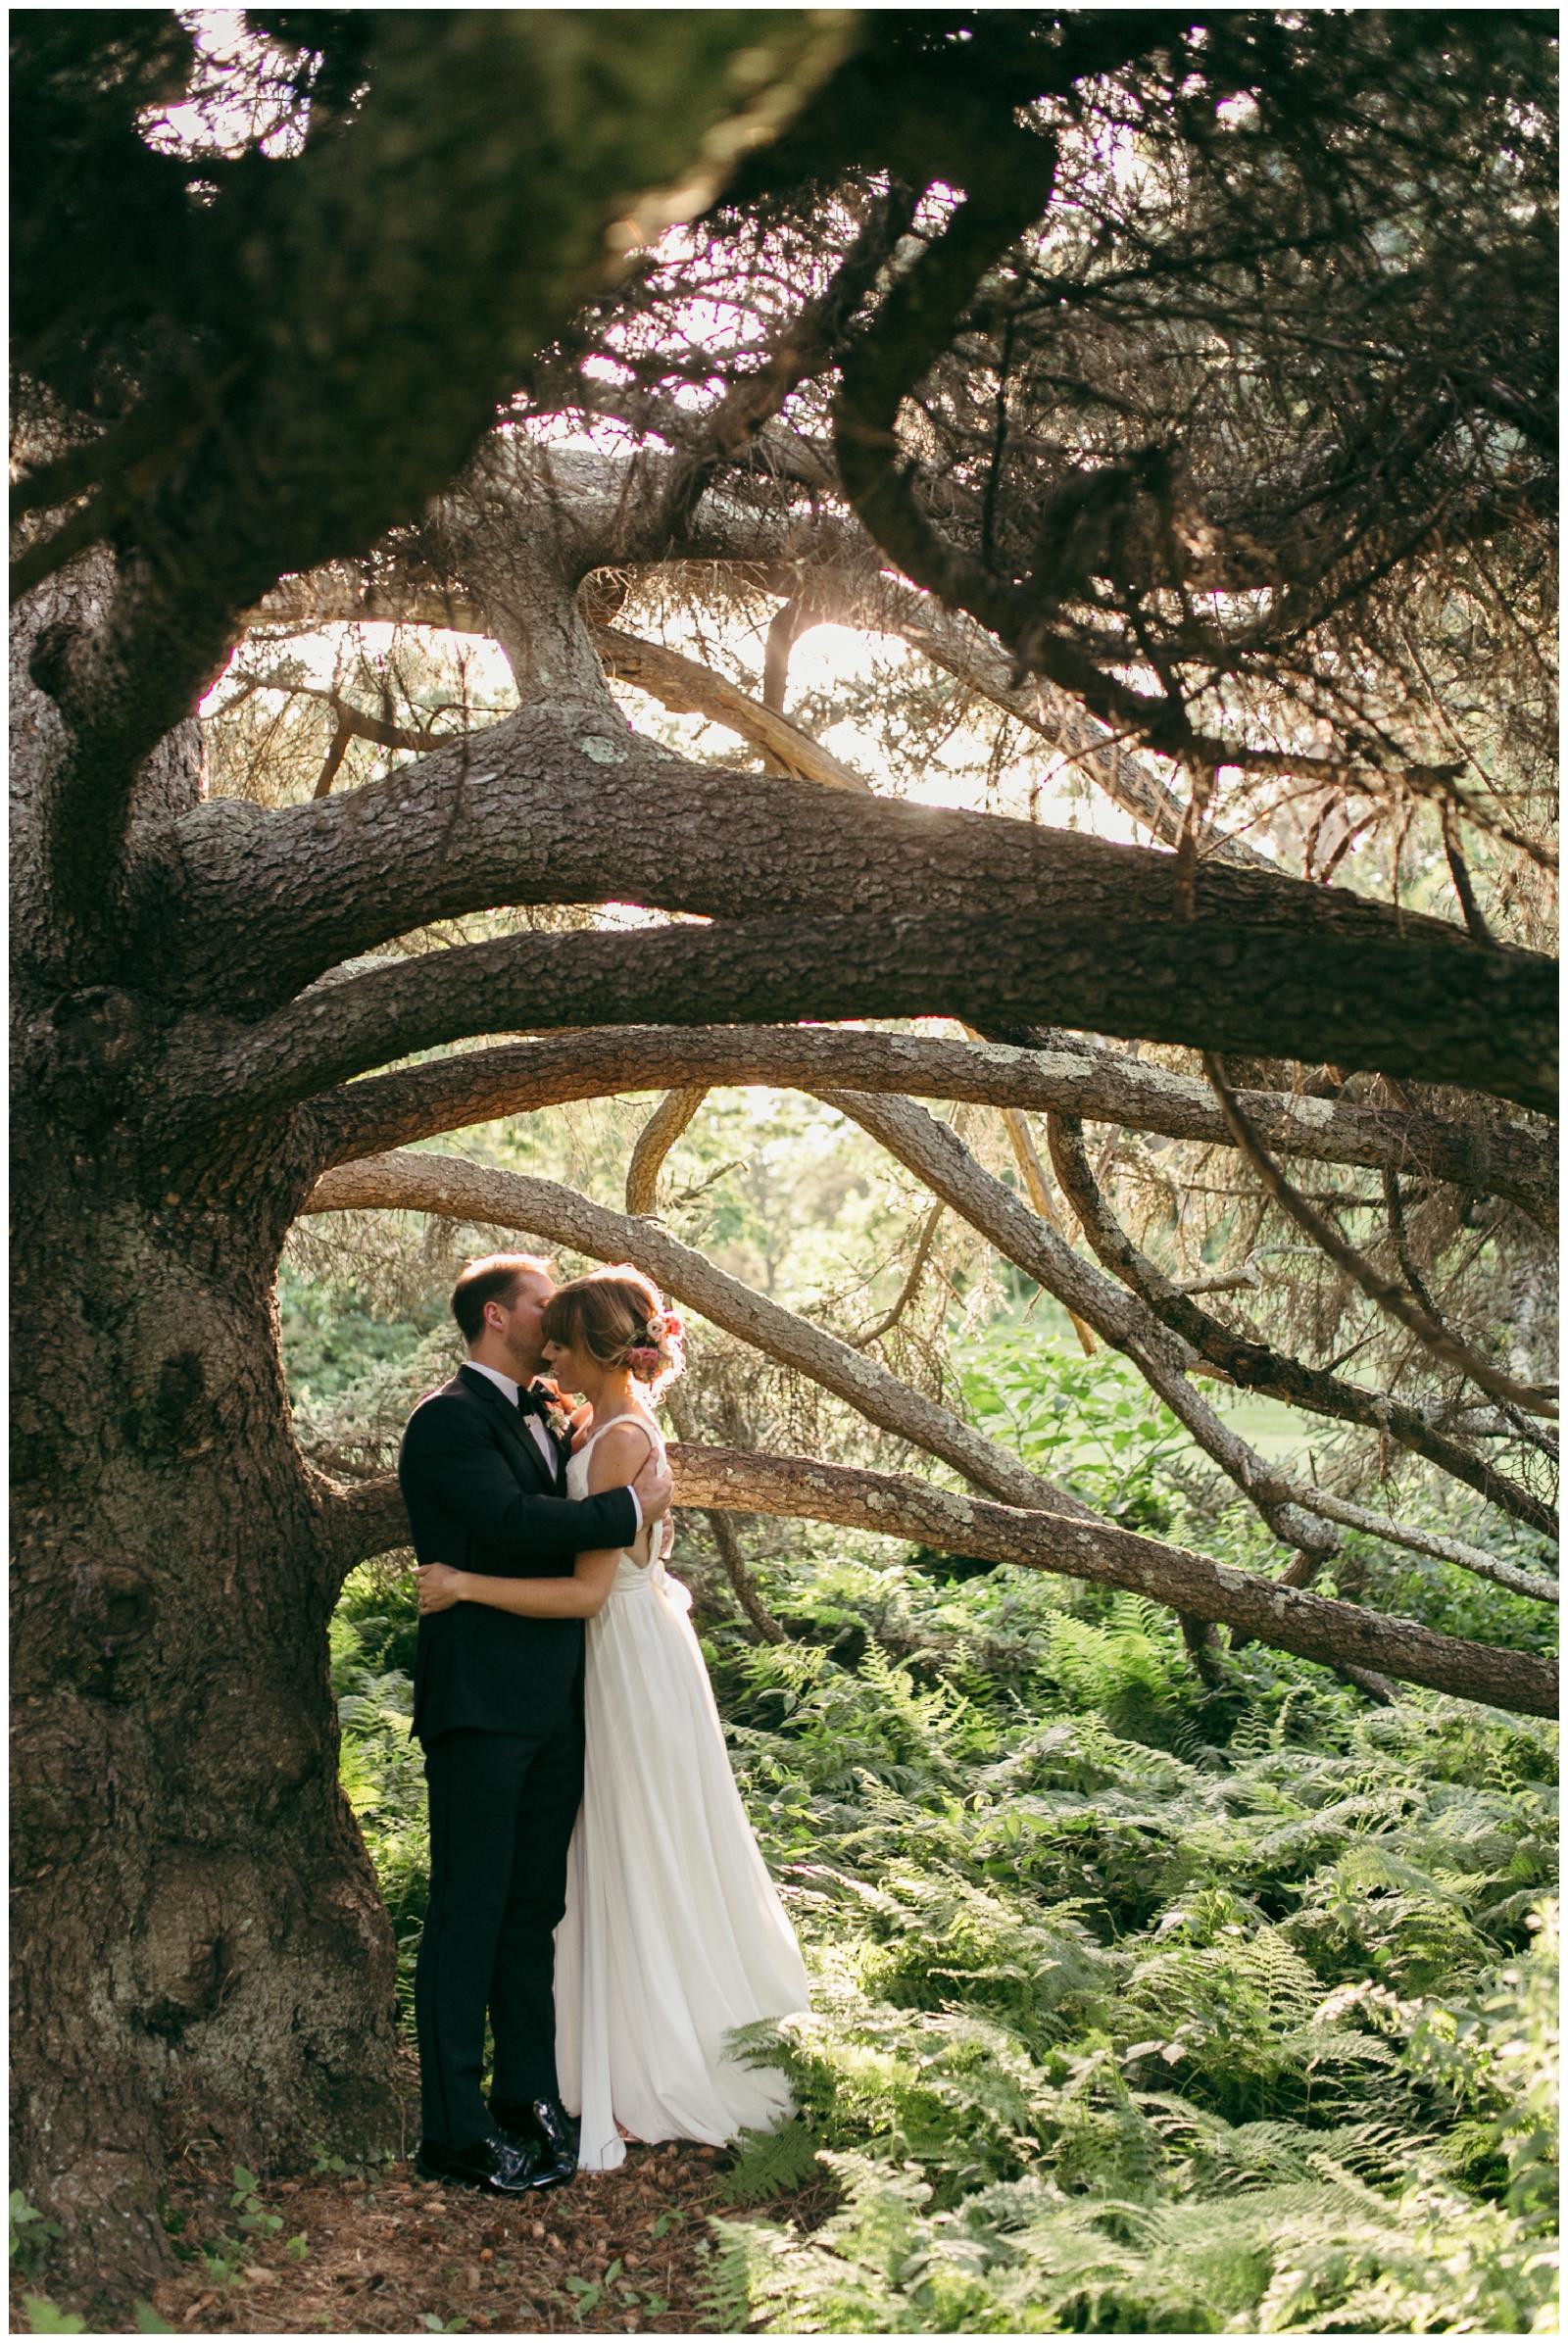 Moraine-Farm-wedding-Bailey-Q-Photo-Massachusetts-wedding-photpgrapher-103.jpg